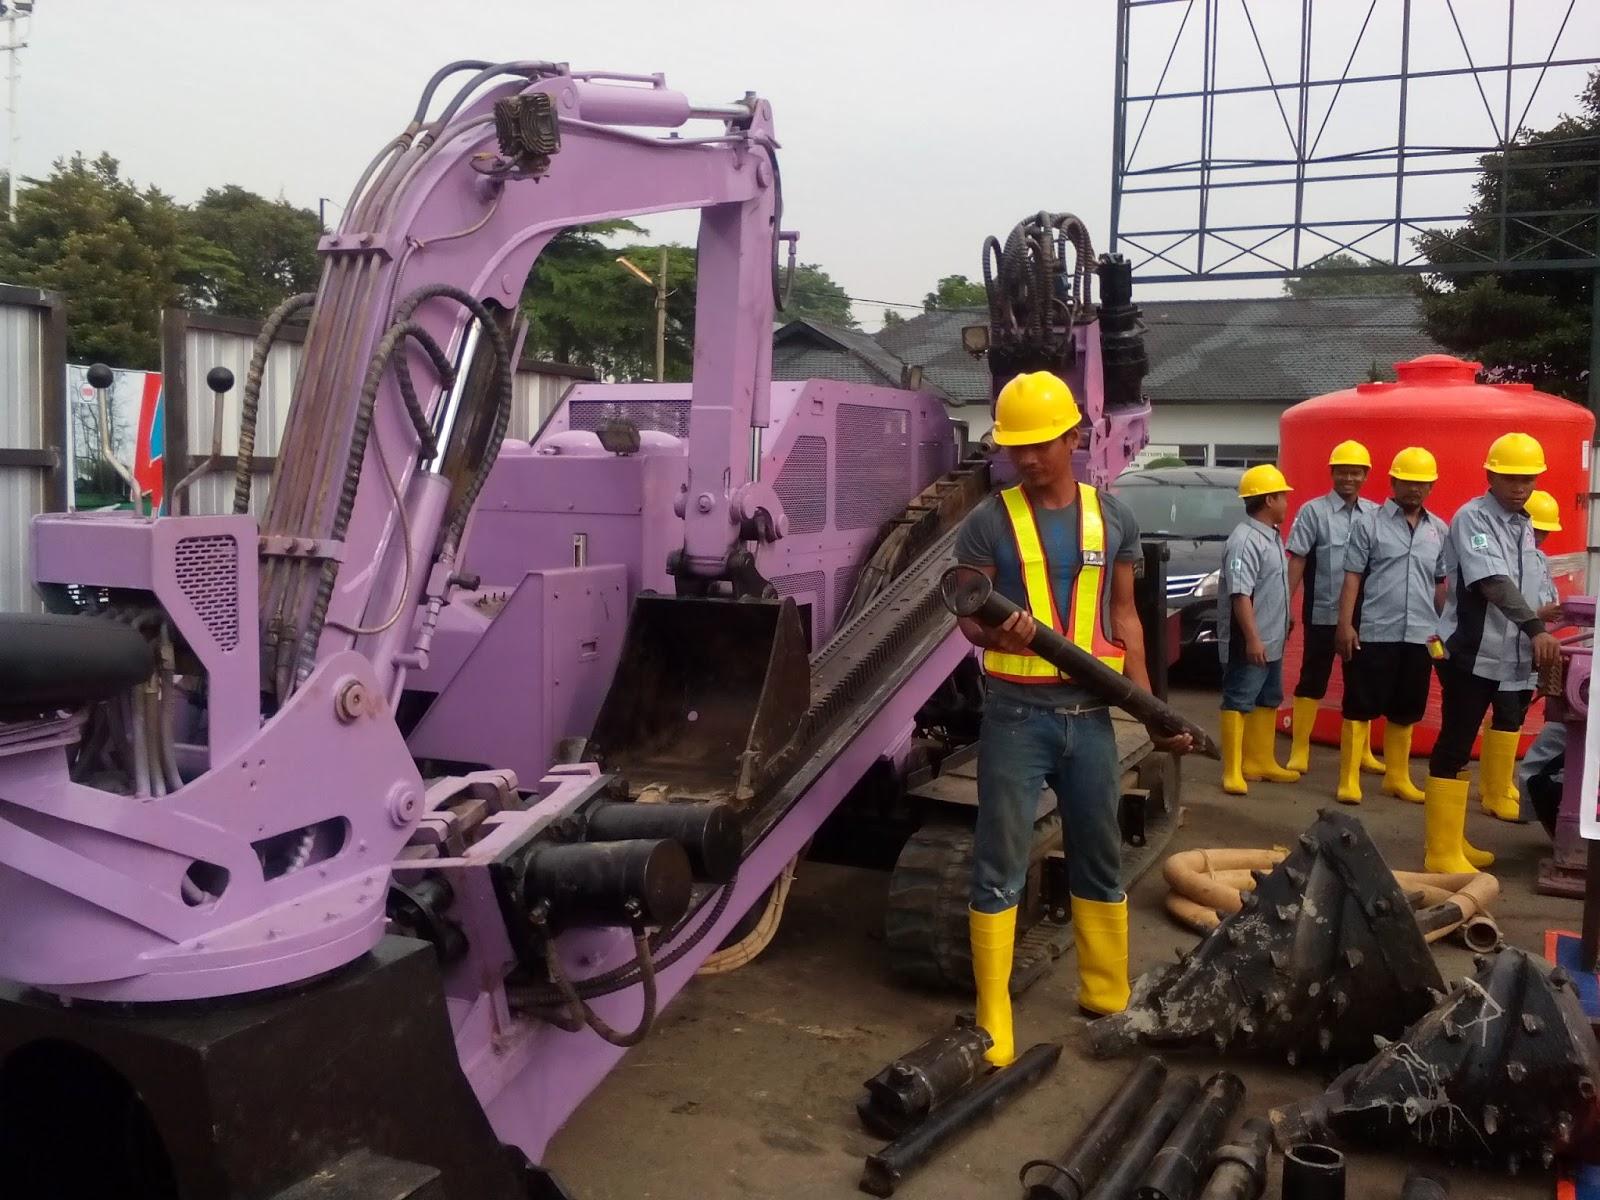 Jelang Asian Games 2018 Pln Disjaya Gelar Peralatan Mesin Bor Hdd Og Indonesia